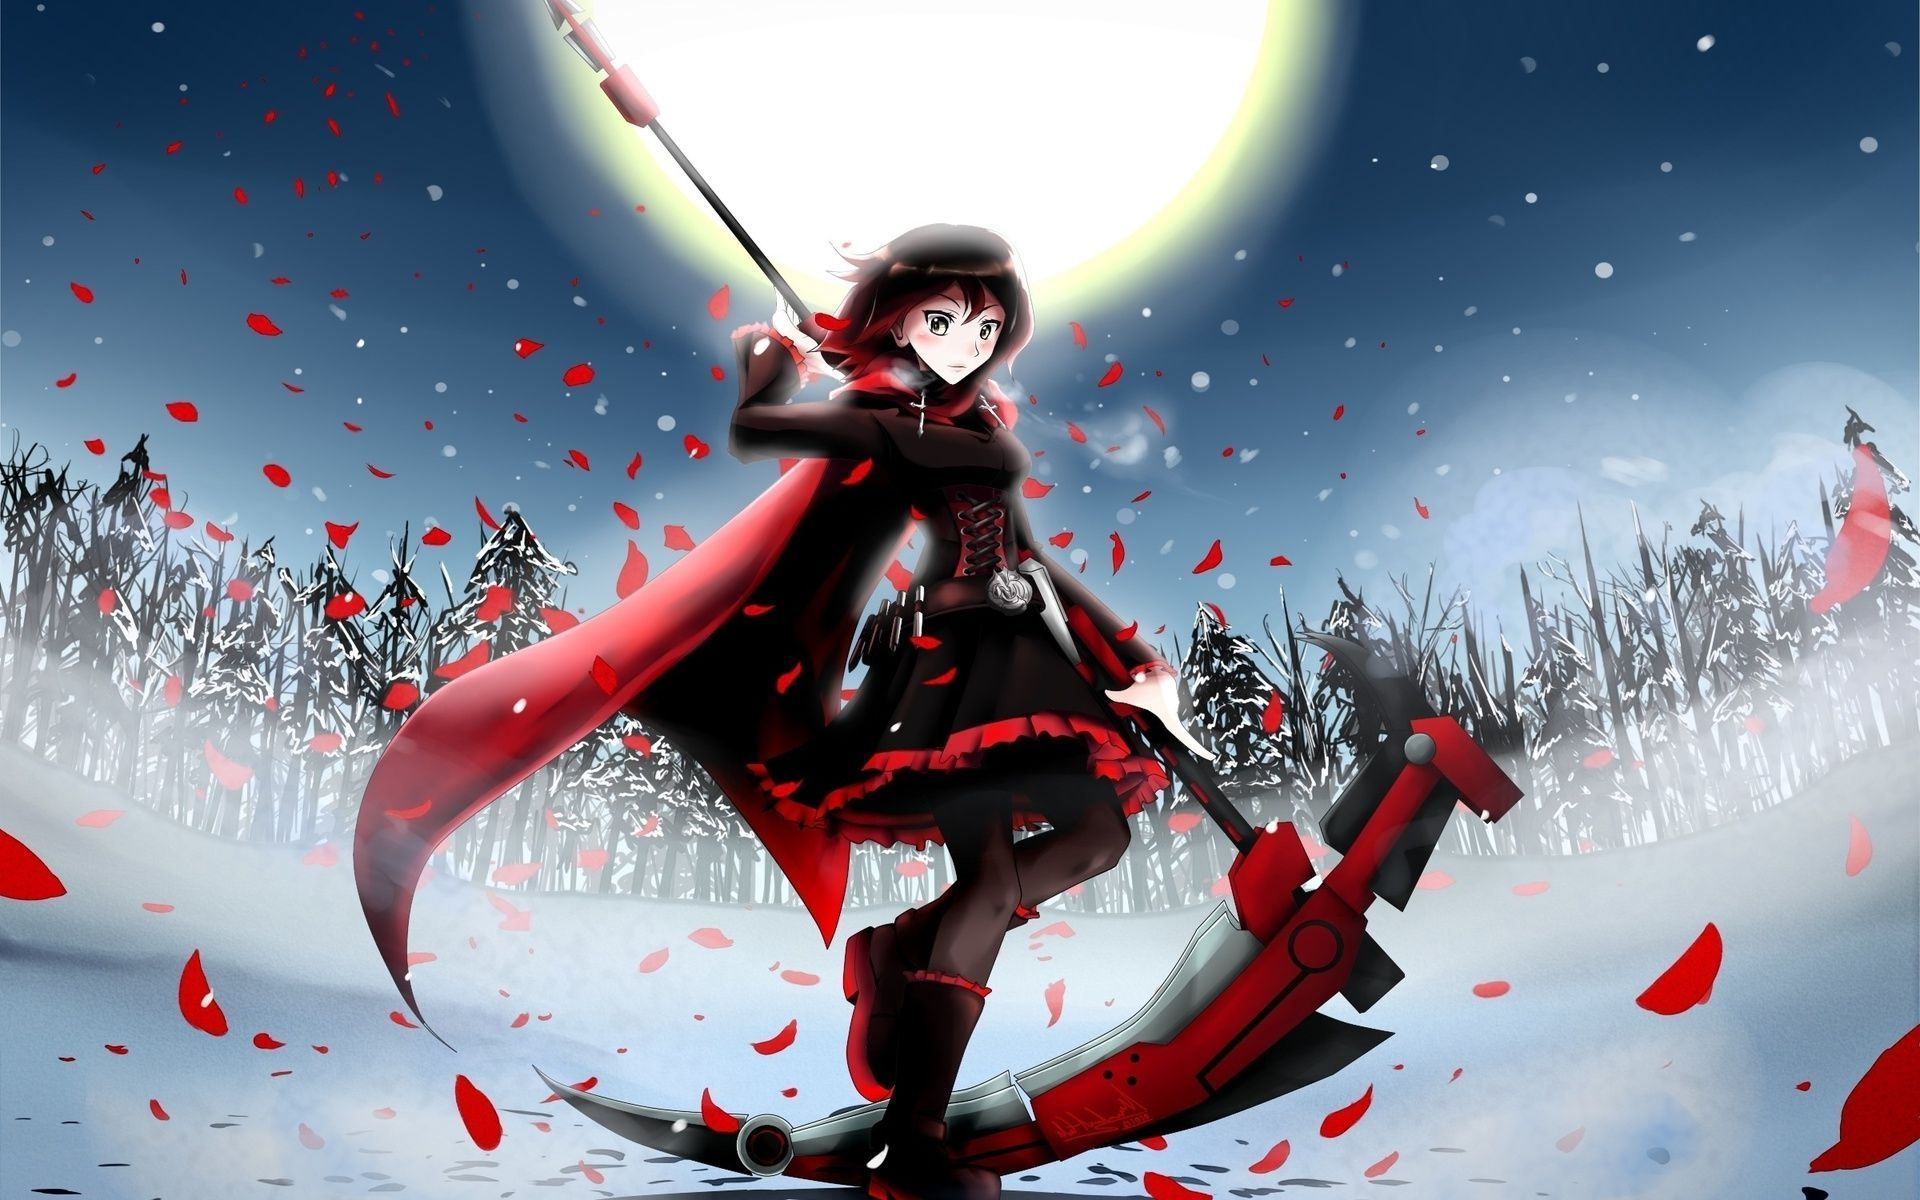 Ruby Rose Rwby Wallpaper 1515 Anime Wallpaper Phone Rwby Wallpaper Anime Wallpaper 1920x1080